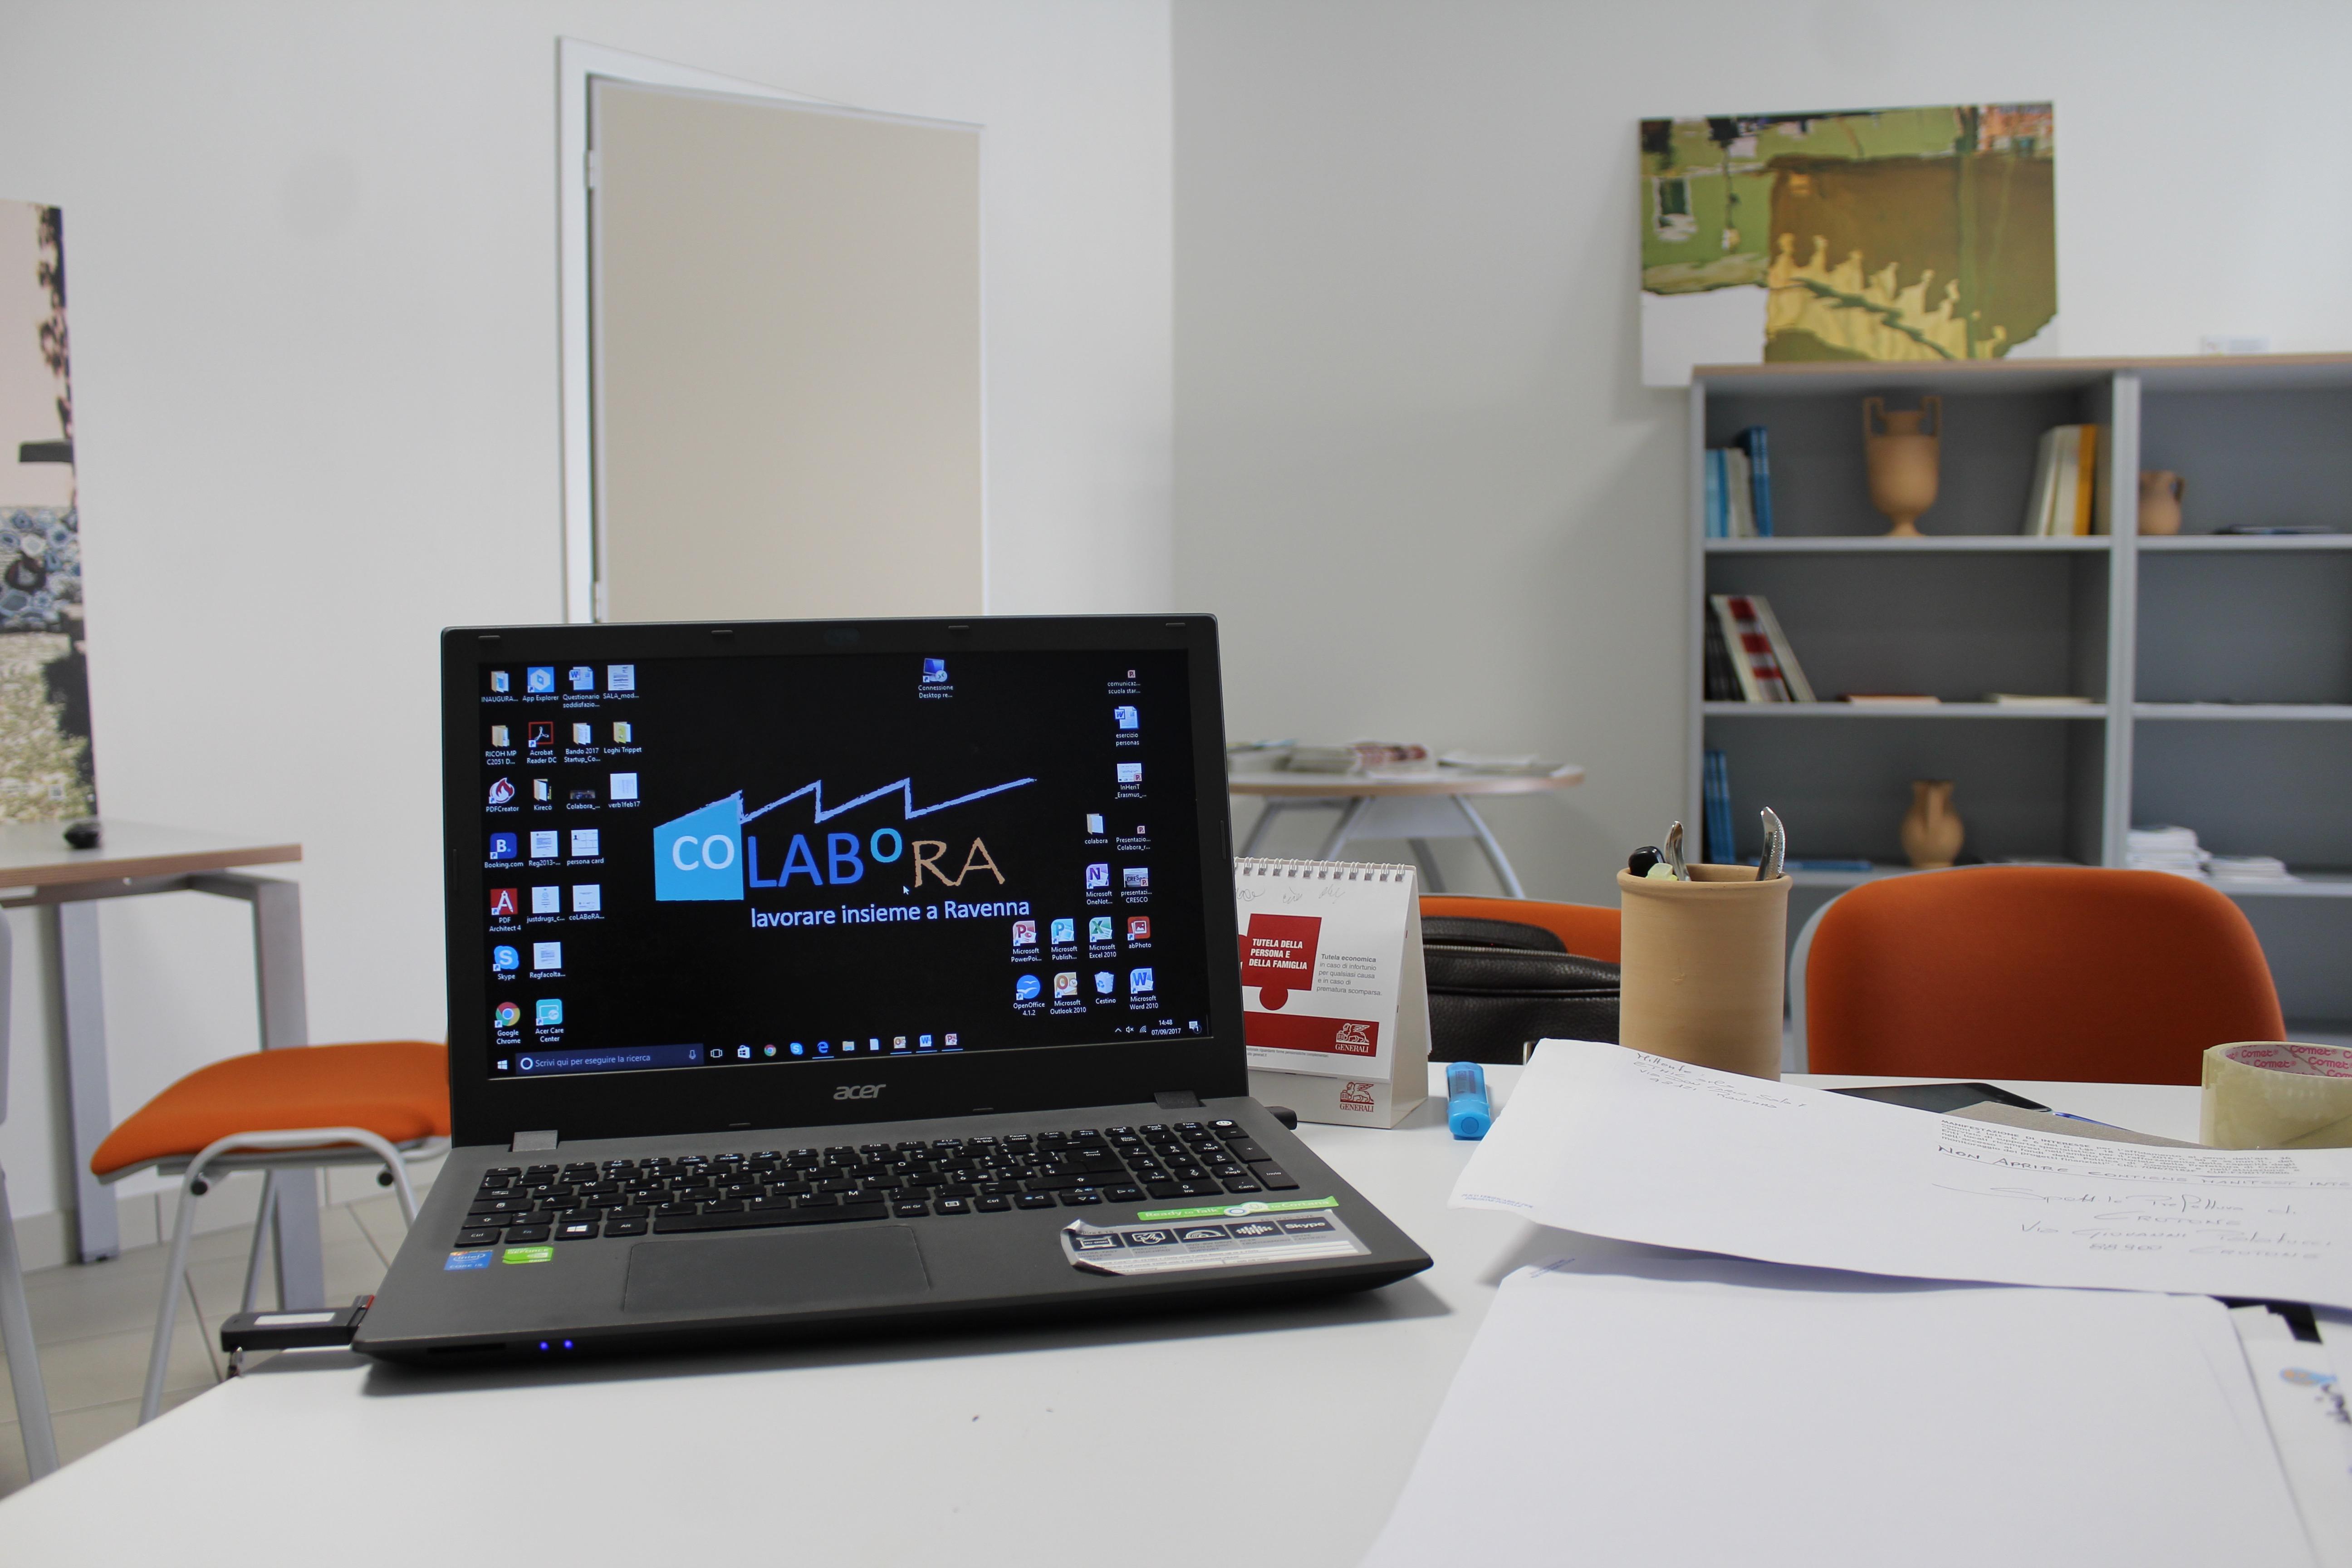 Ufficio Creativo Faenza : F rava faenza vaso ciotola maiolica graffita dipinta epoca